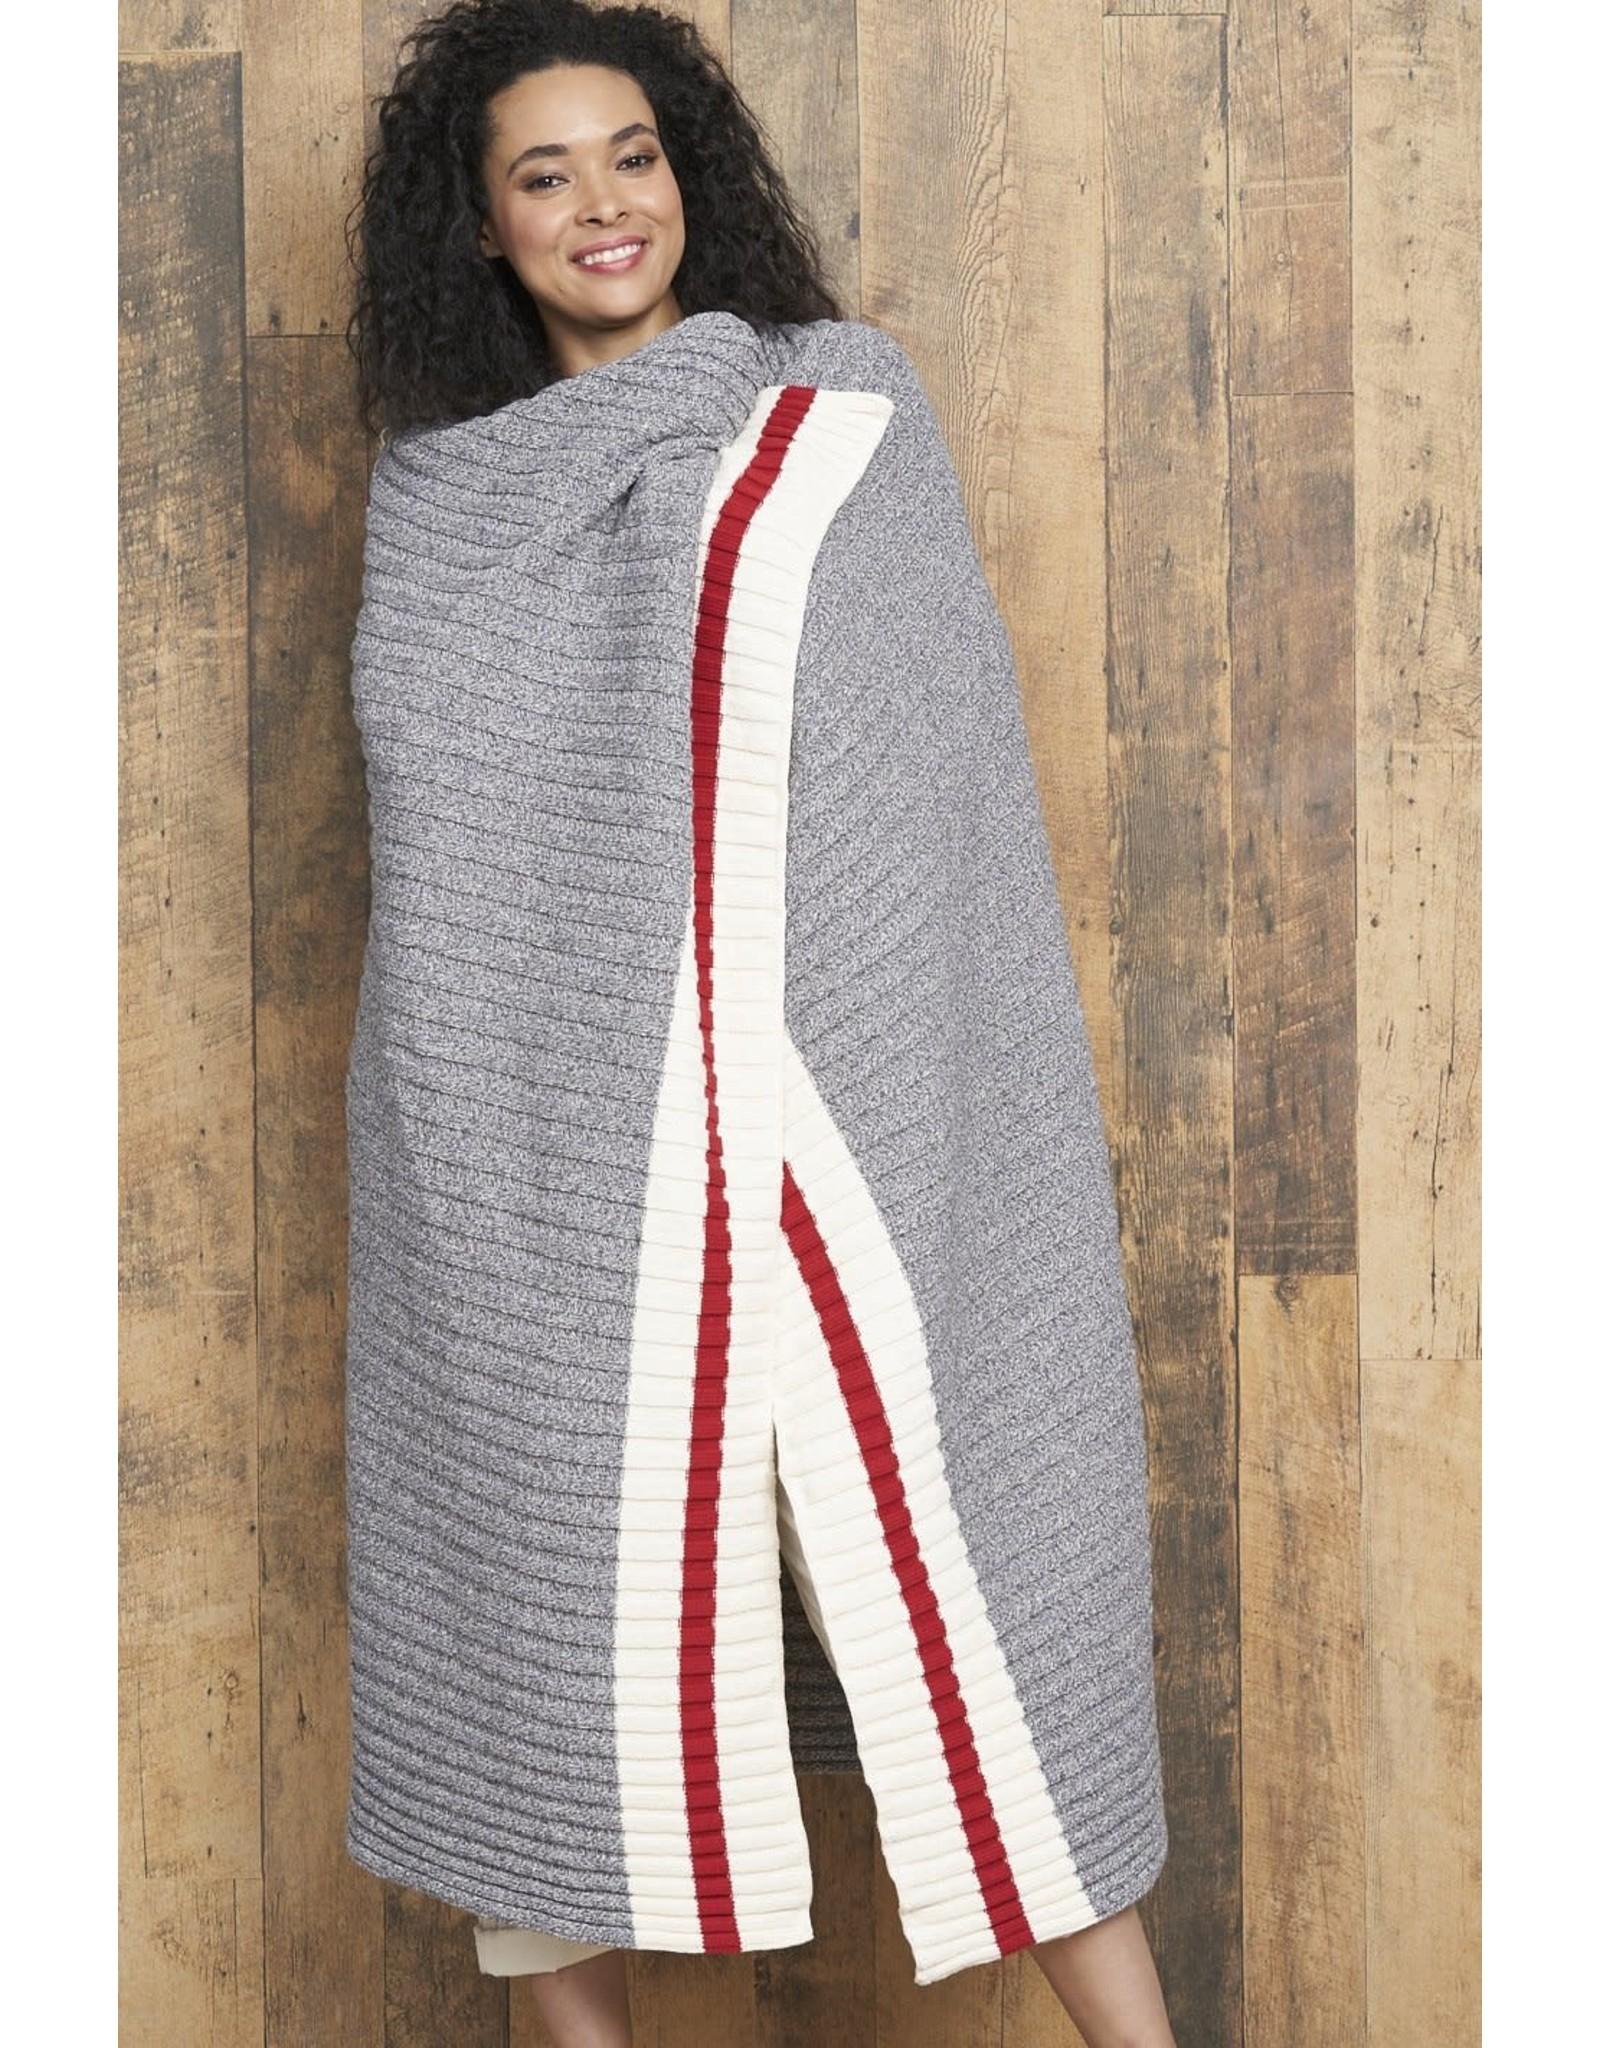 Parkhurst Collegiate Blanket Grey Mix